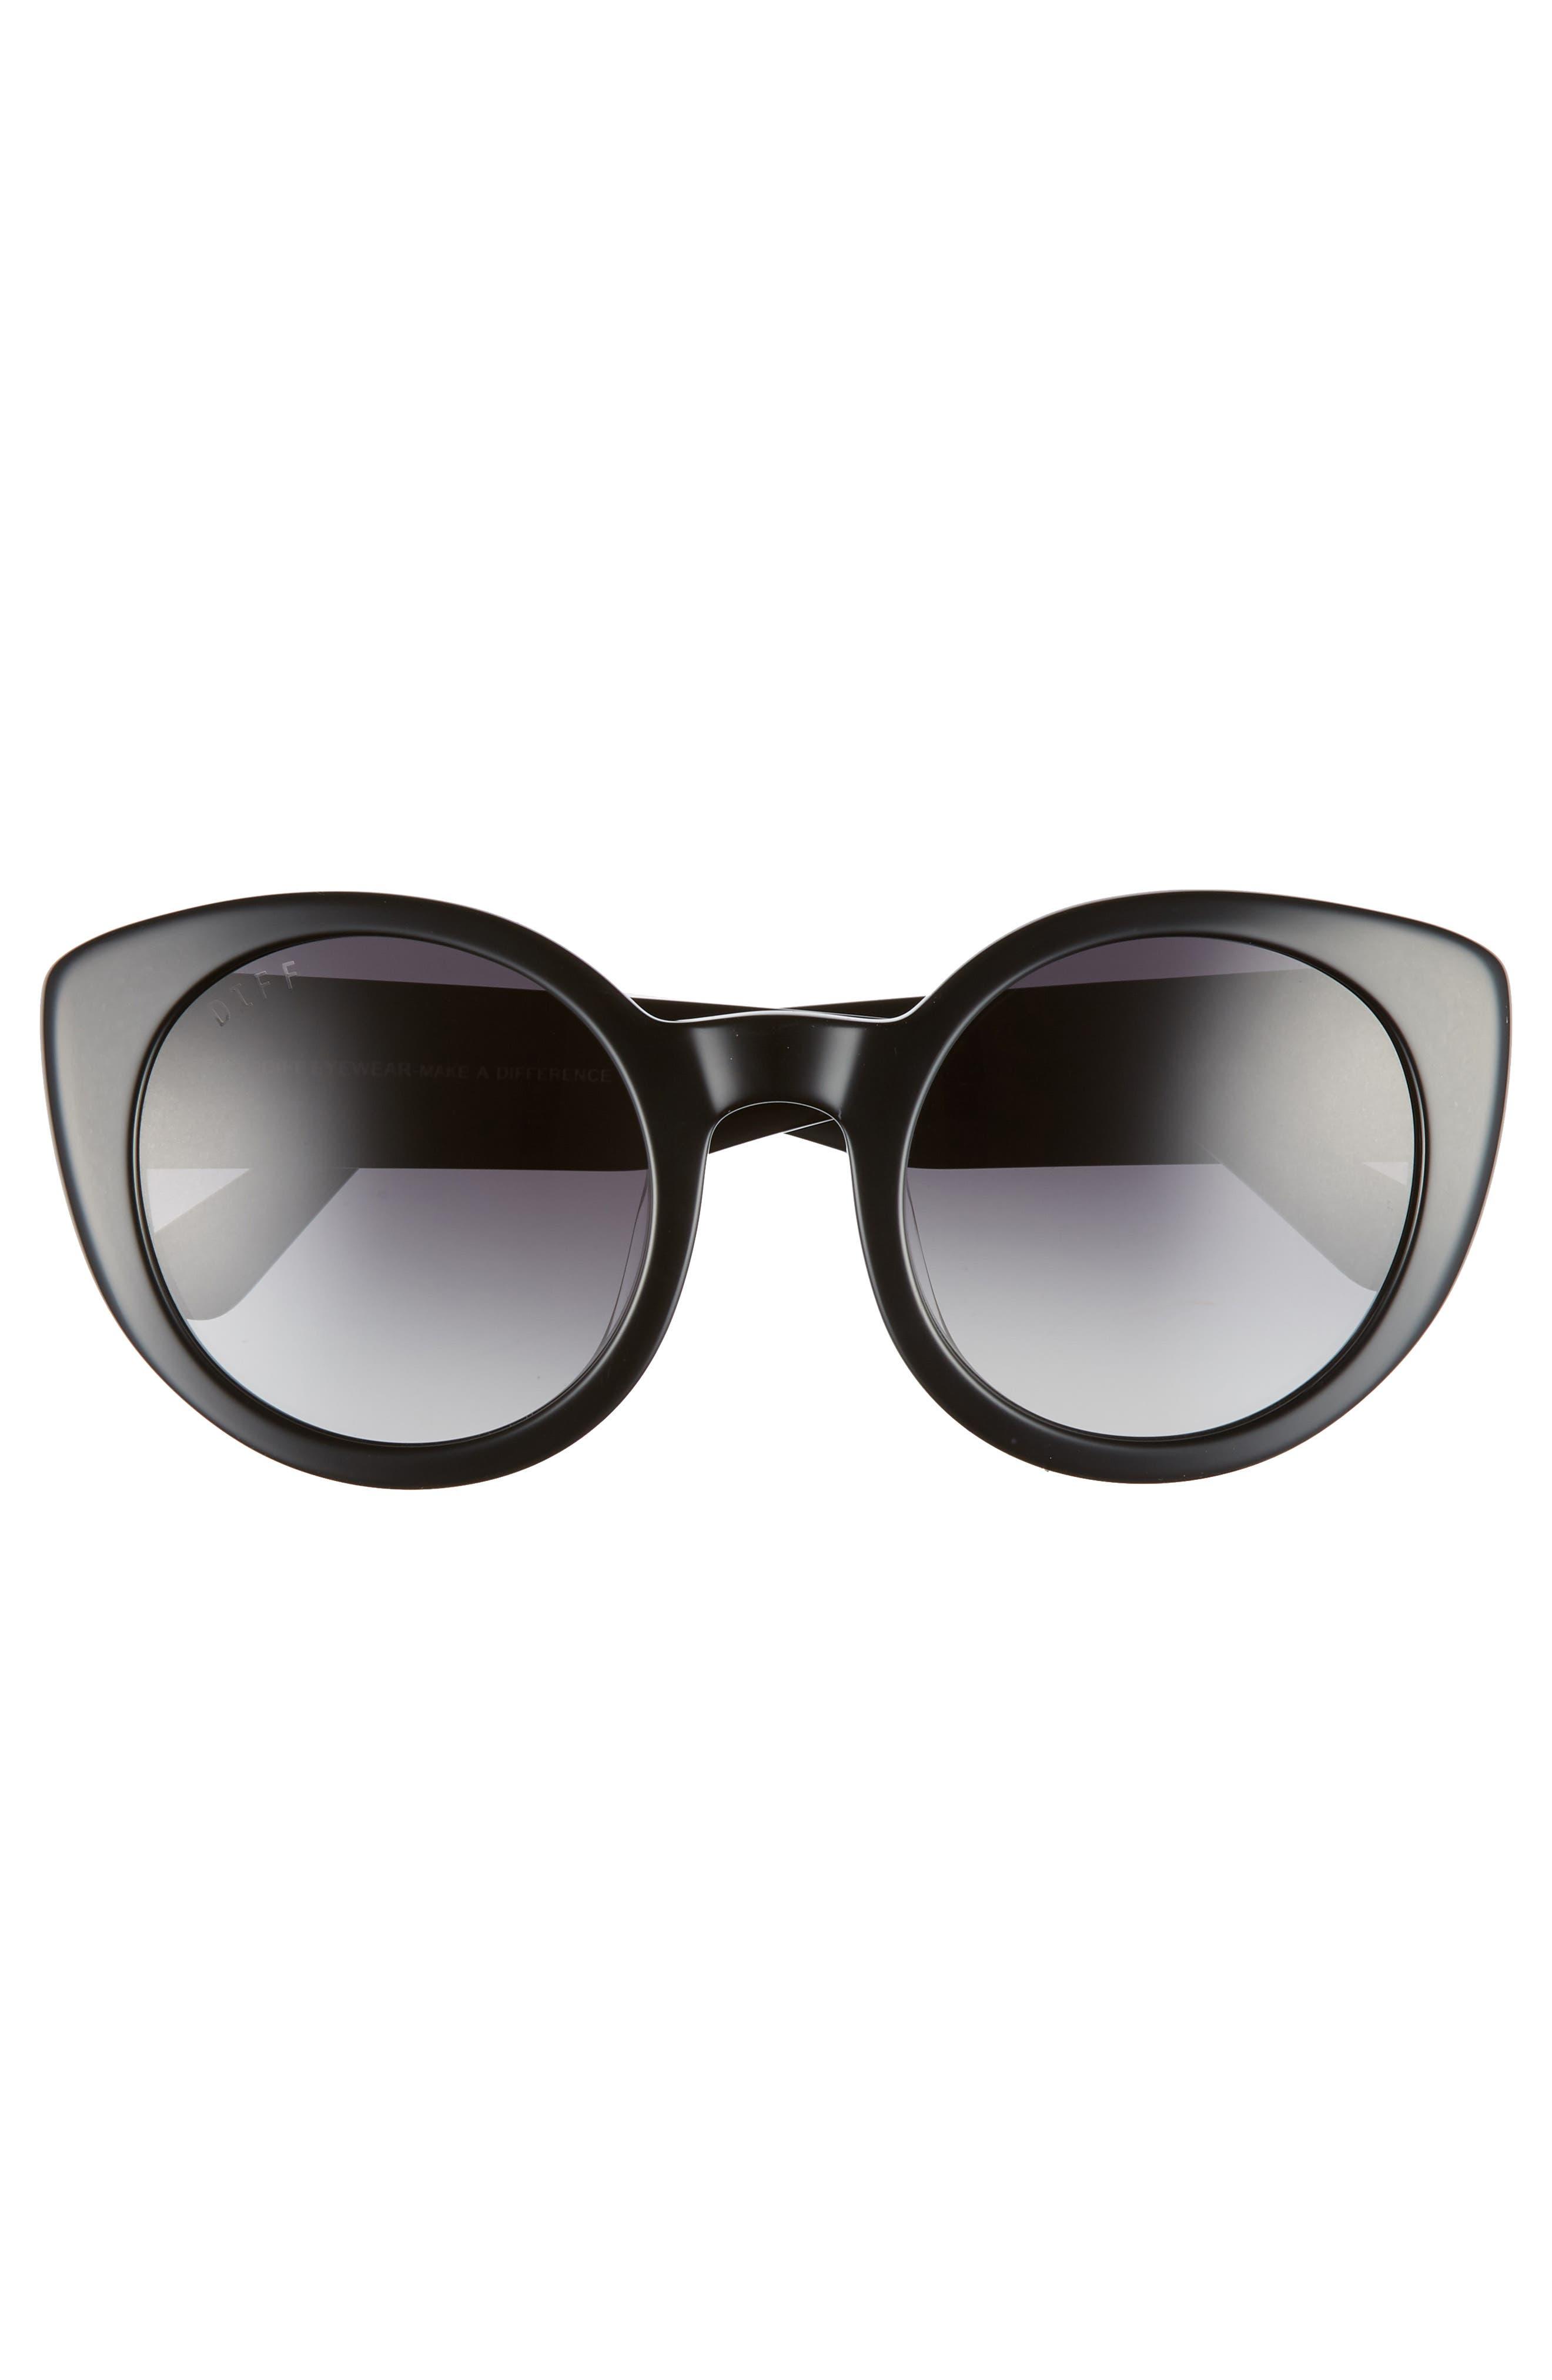 Luna 54mm Polarized Round Sunglasses,                             Alternate thumbnail 3, color,                             BLACK/ GREY